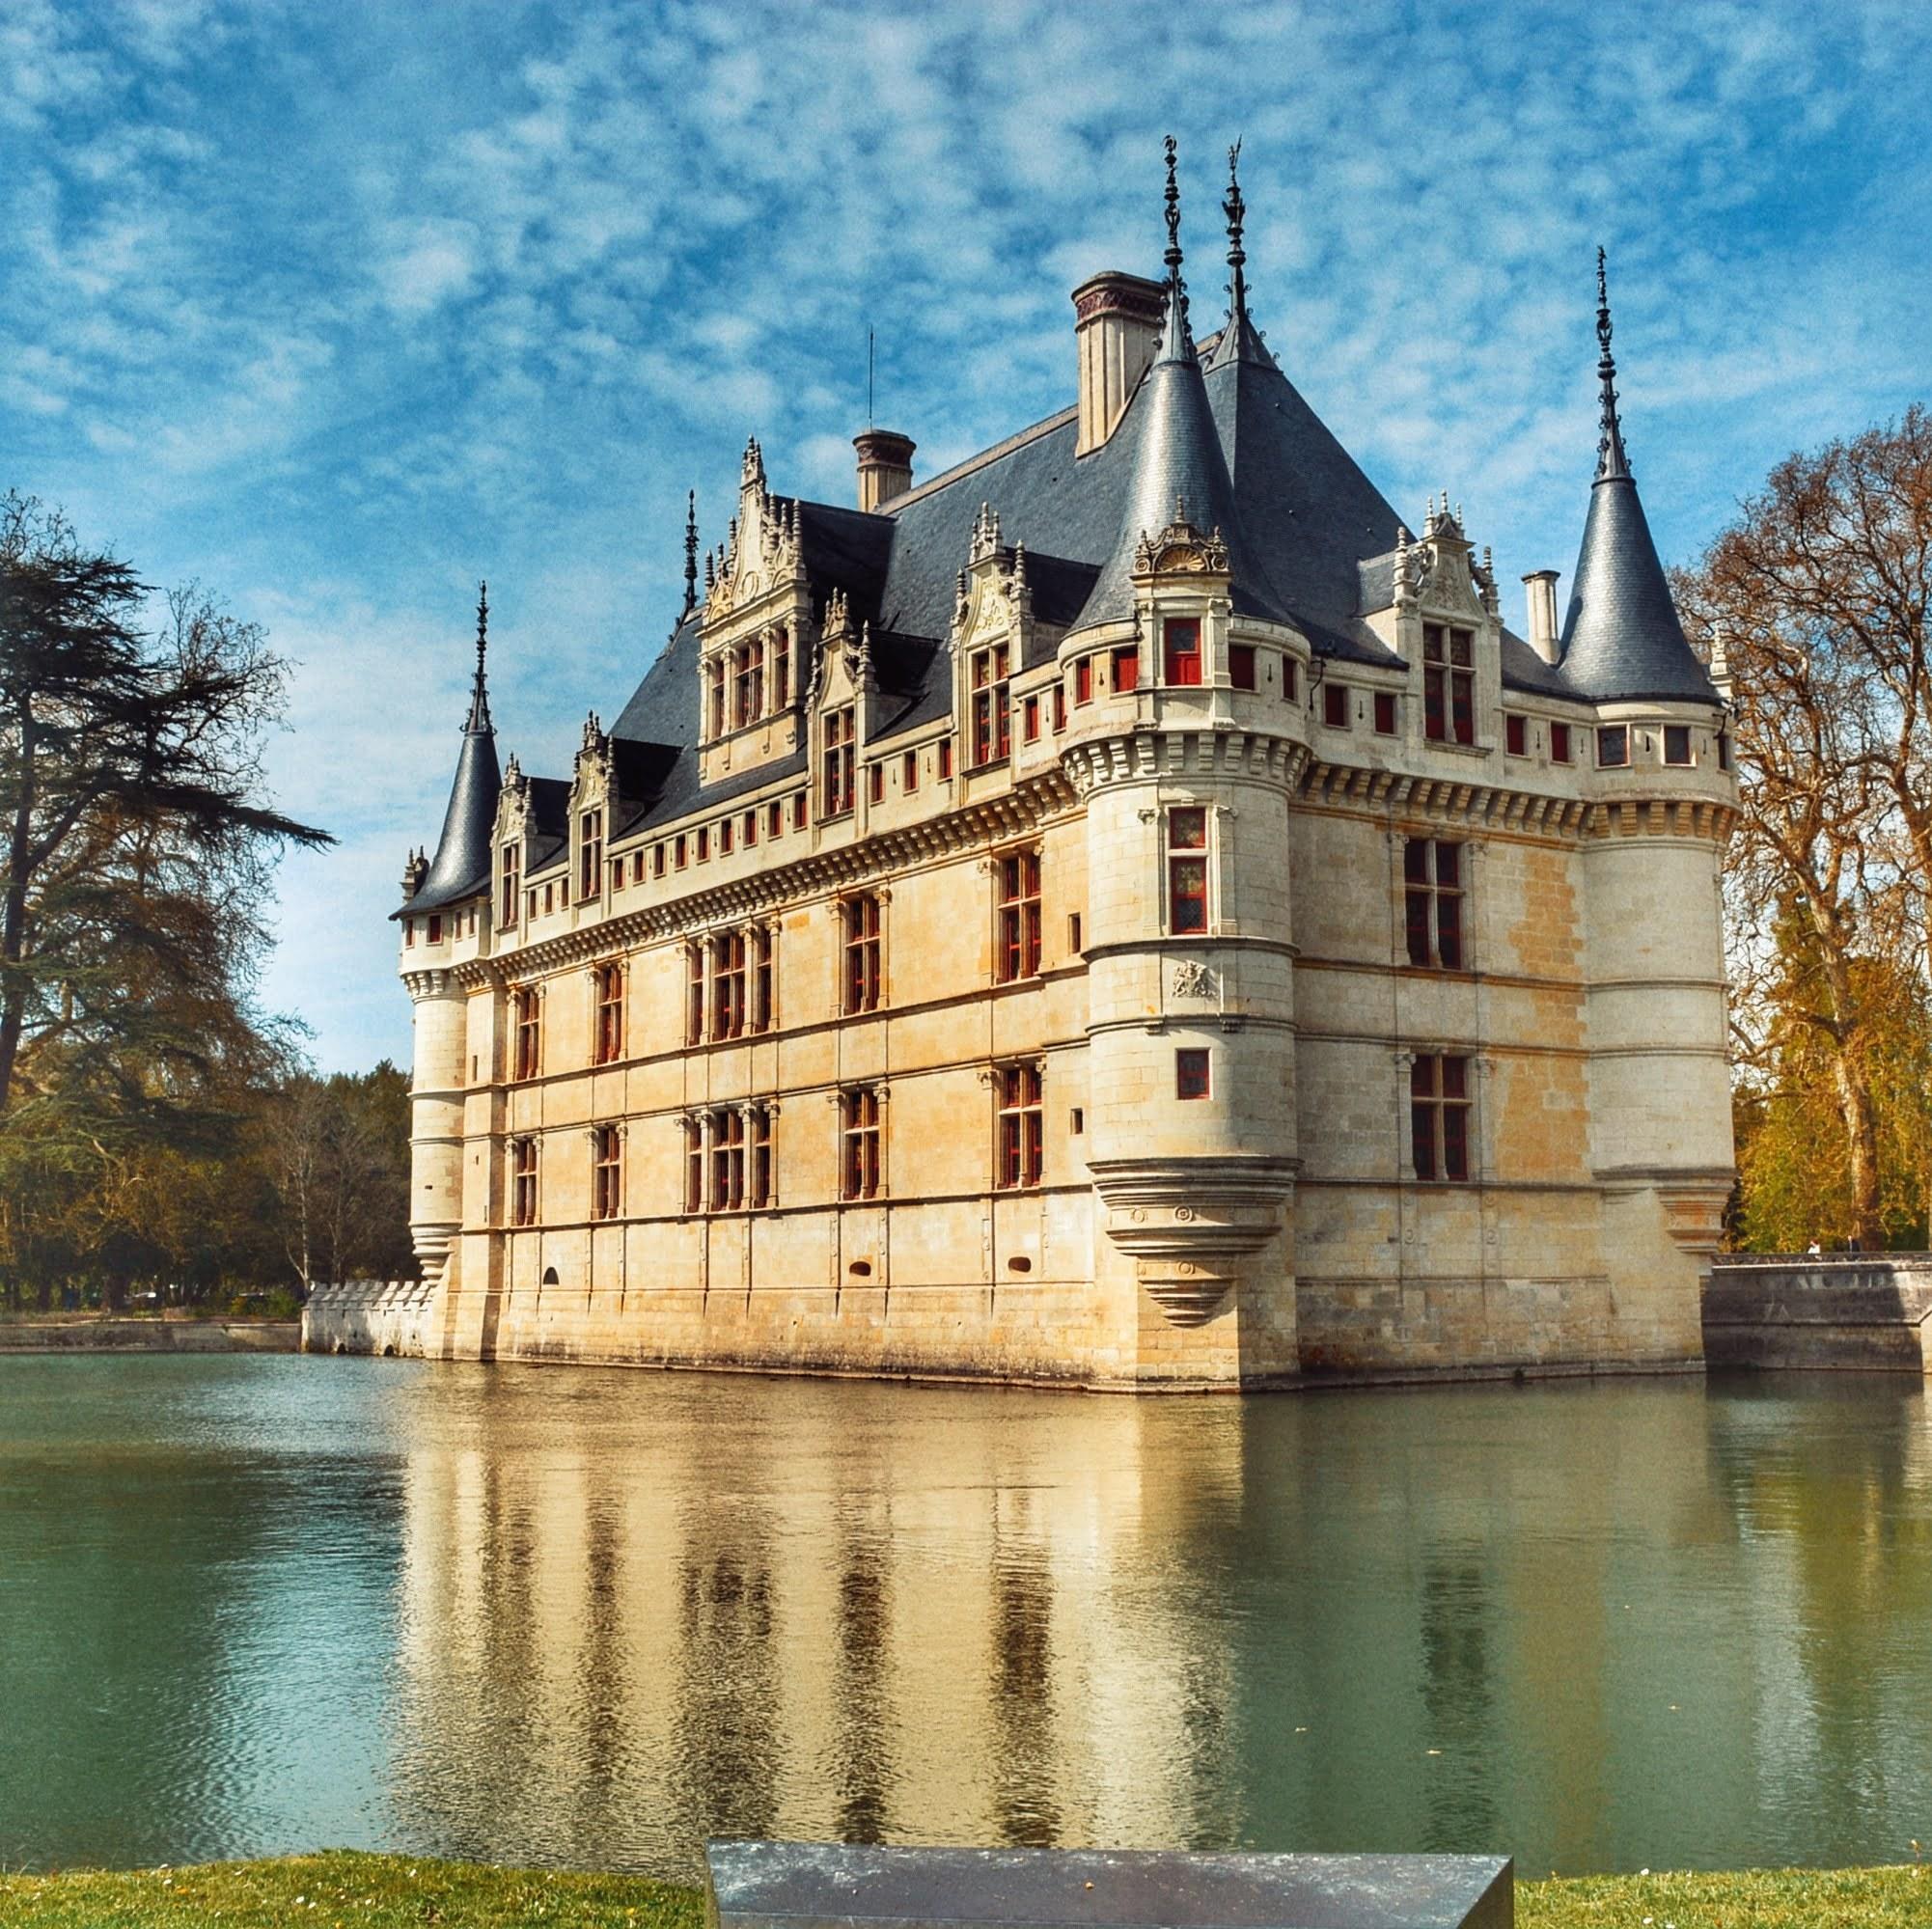 Ruta Castillos del Loira: El Castillo Azay le Rideau + 8 castillos más